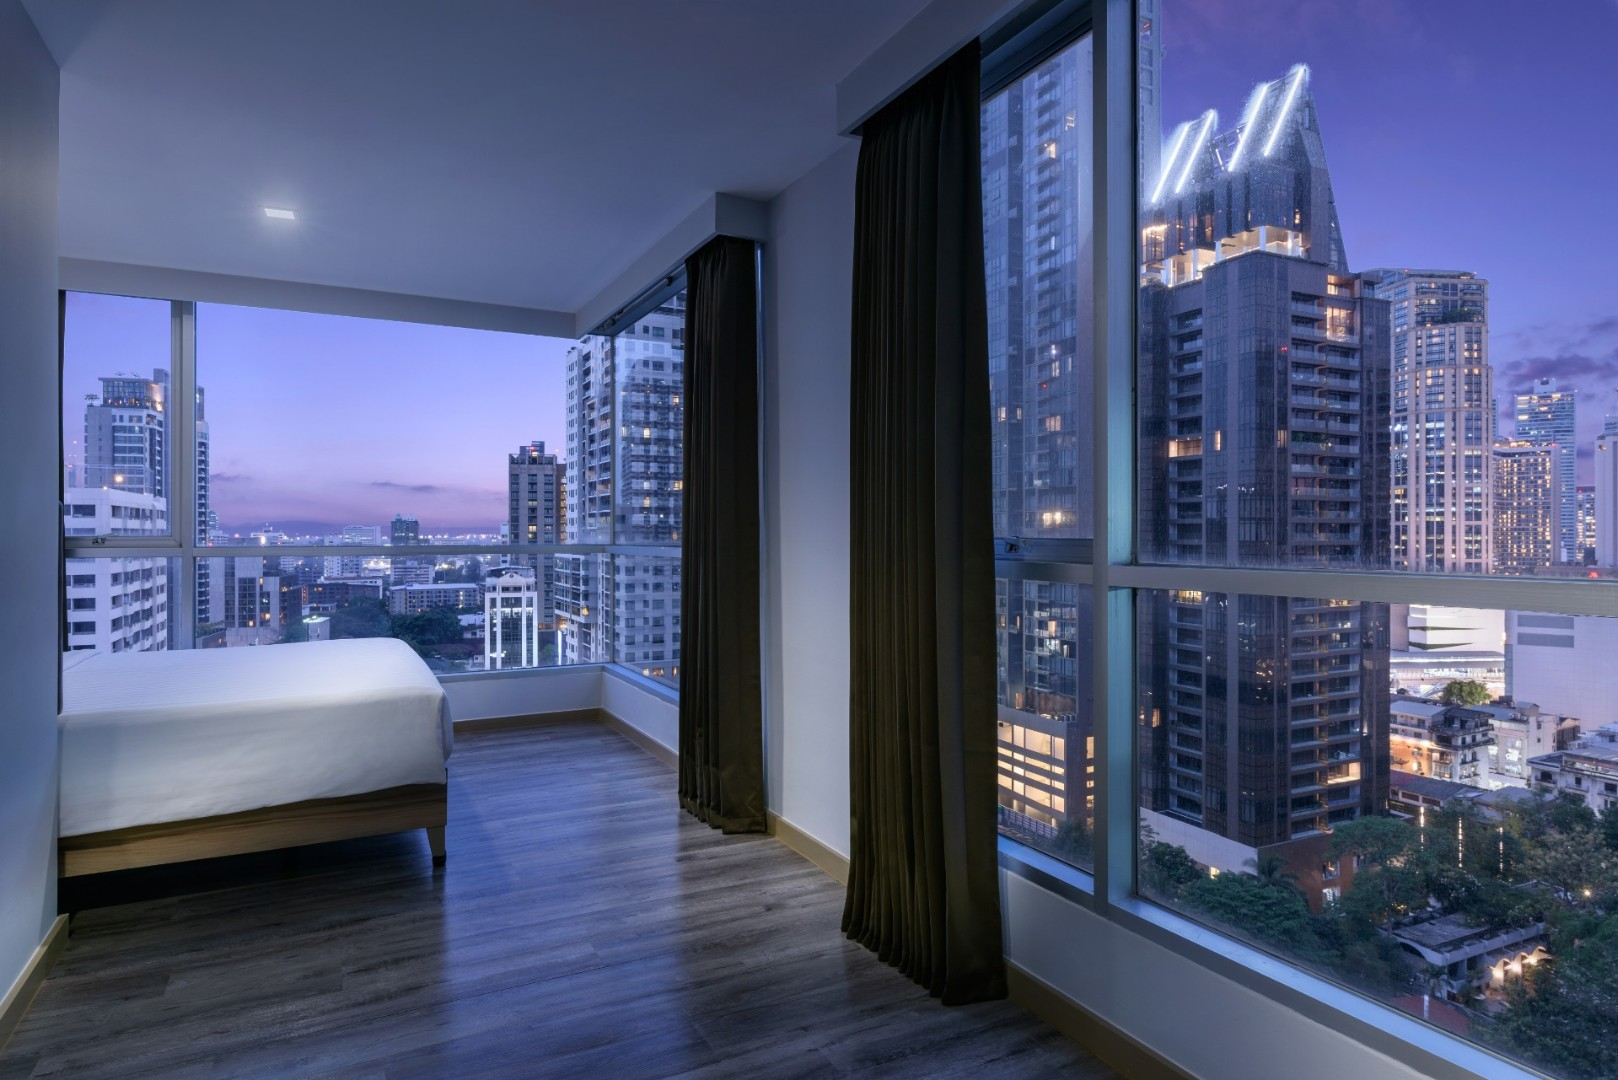 Adelphi Grande Sukhumvit Hotel - Deluxe Suite C Bedroom nighttime-07.jpg